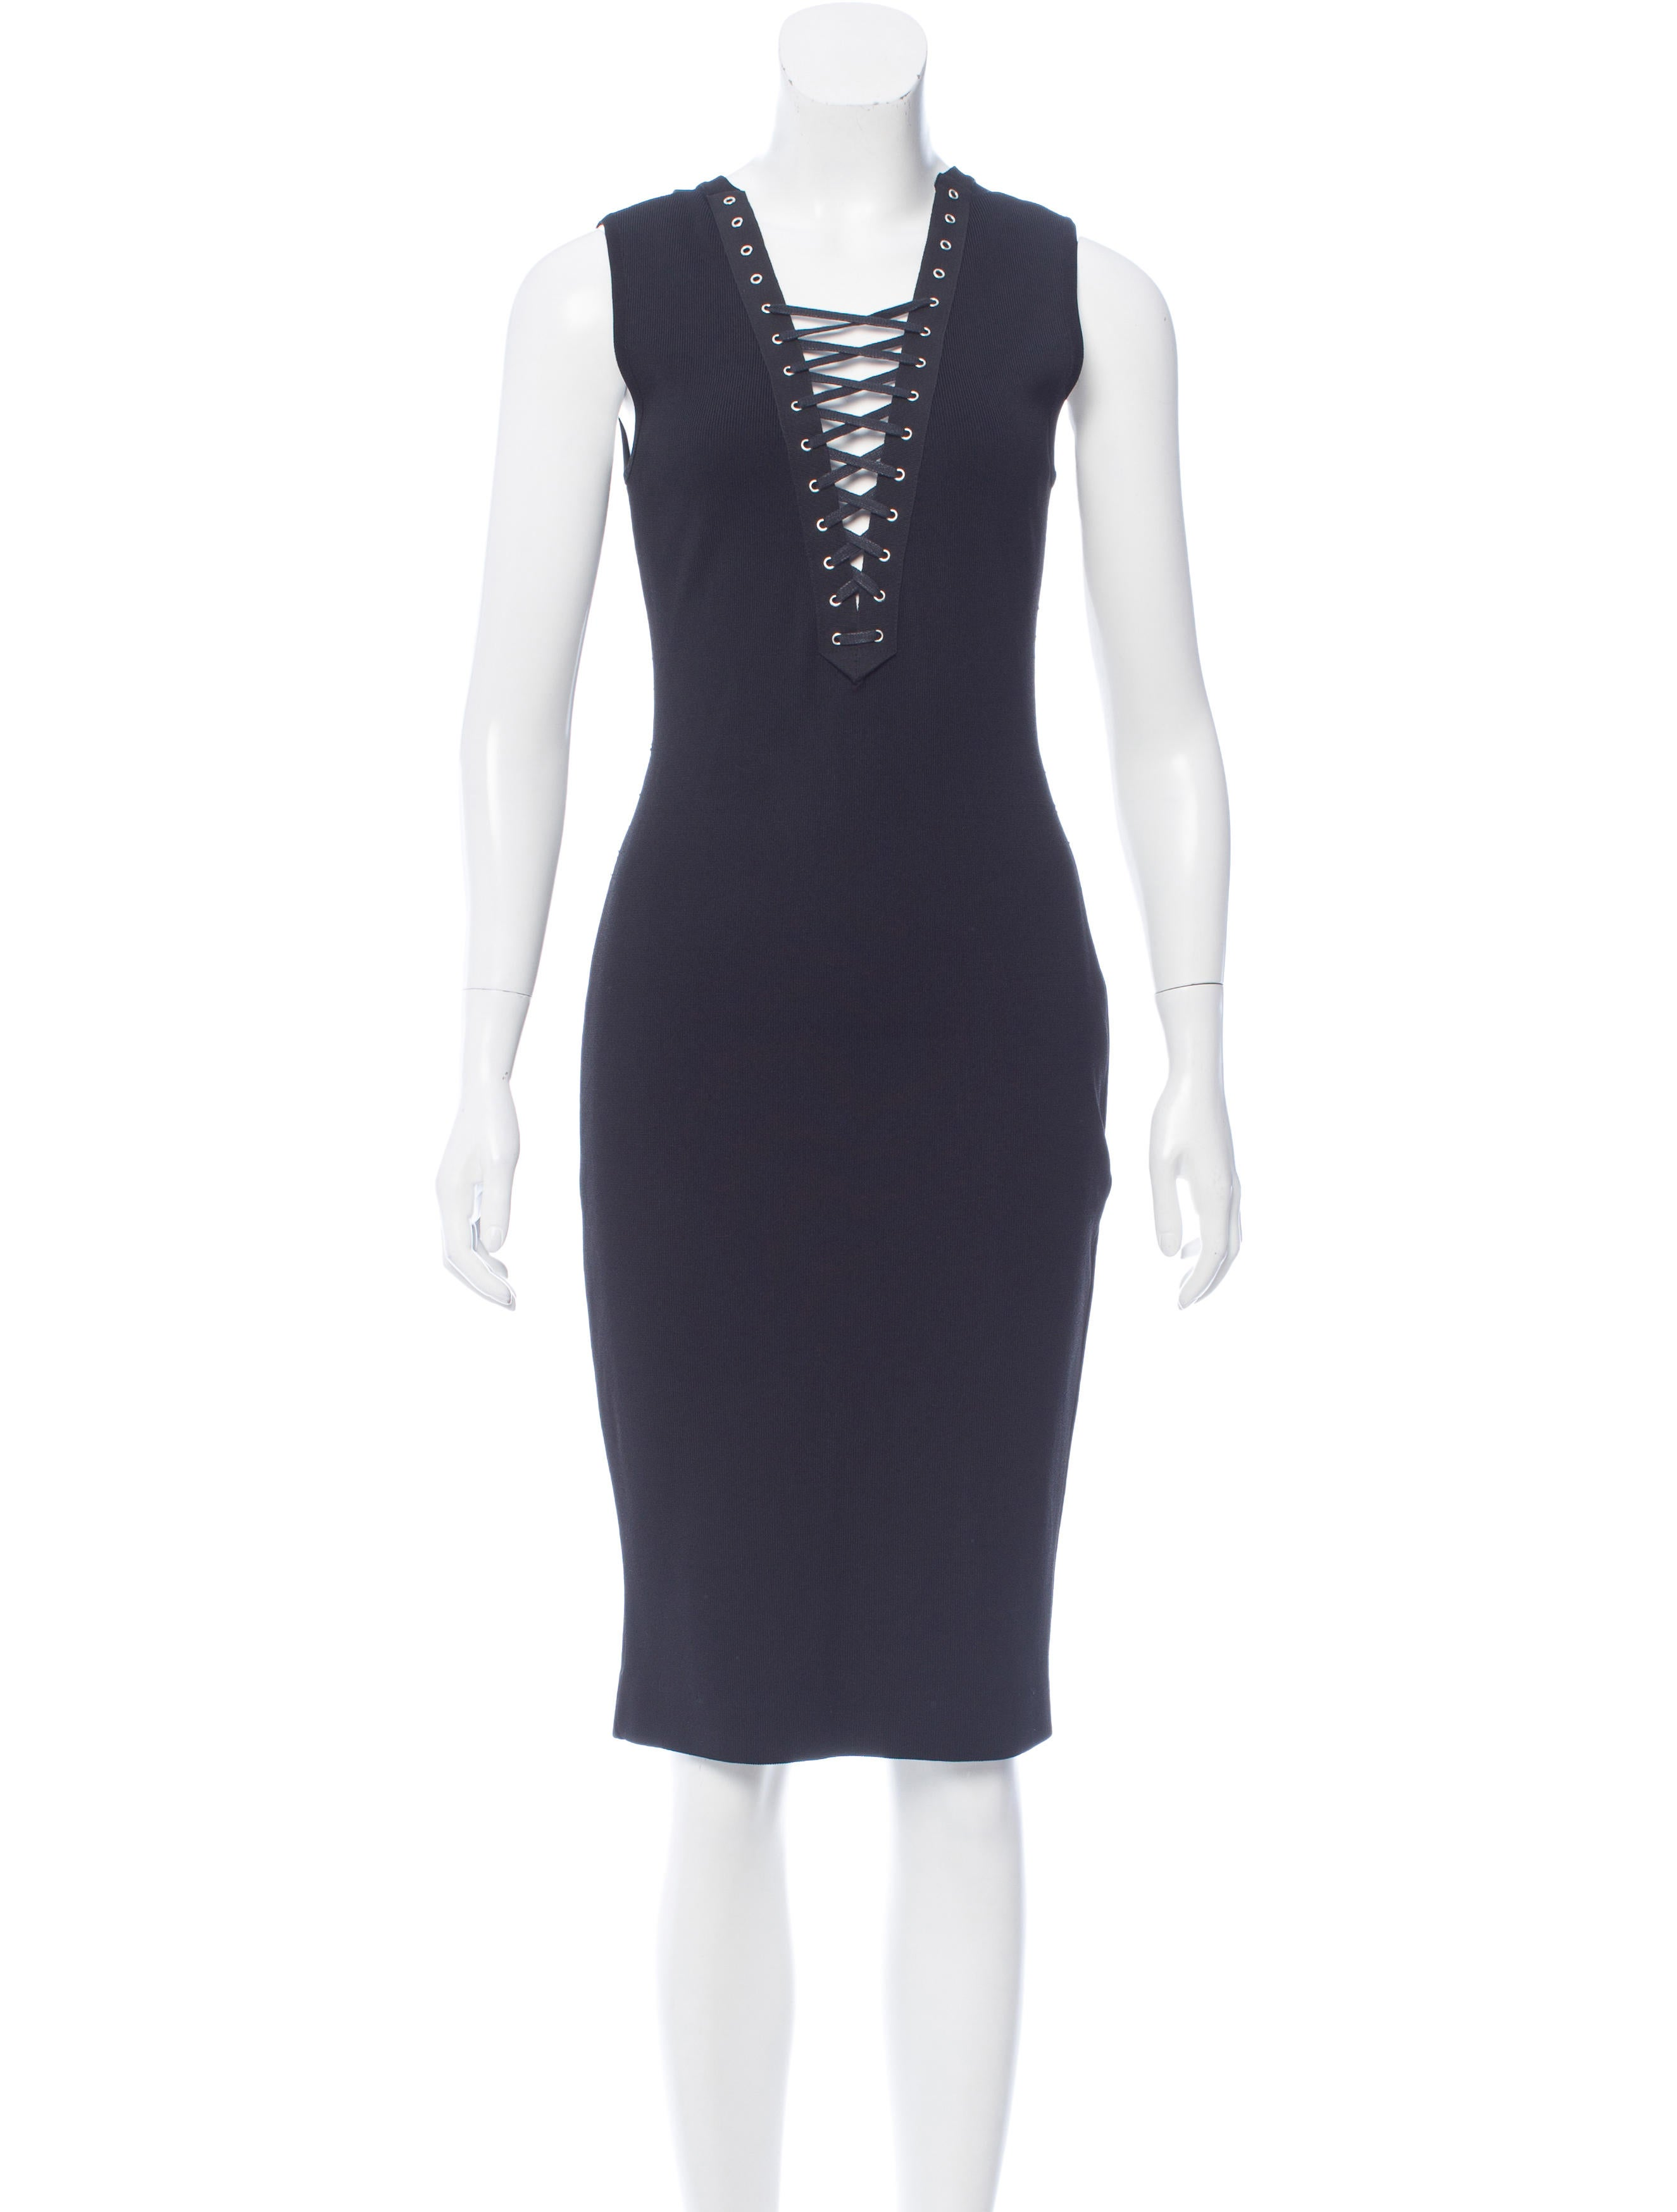 Altuzarra Lace Up Fitted Midi Dress Clothing Alt21868